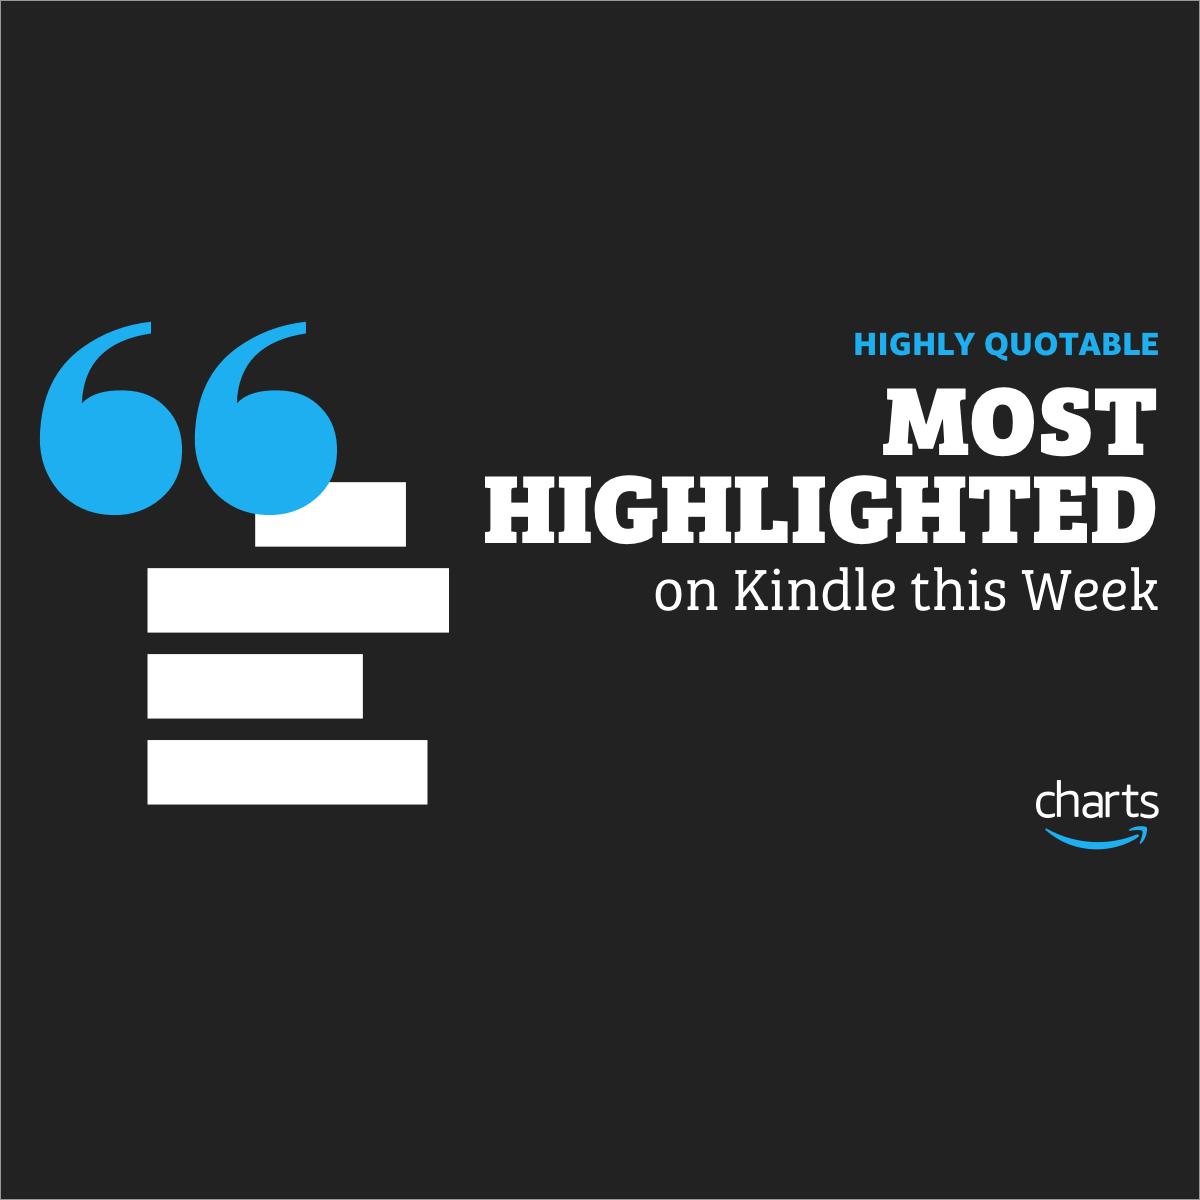 Amazon Charts Top 20 Books in 2019 | Amazon | Books